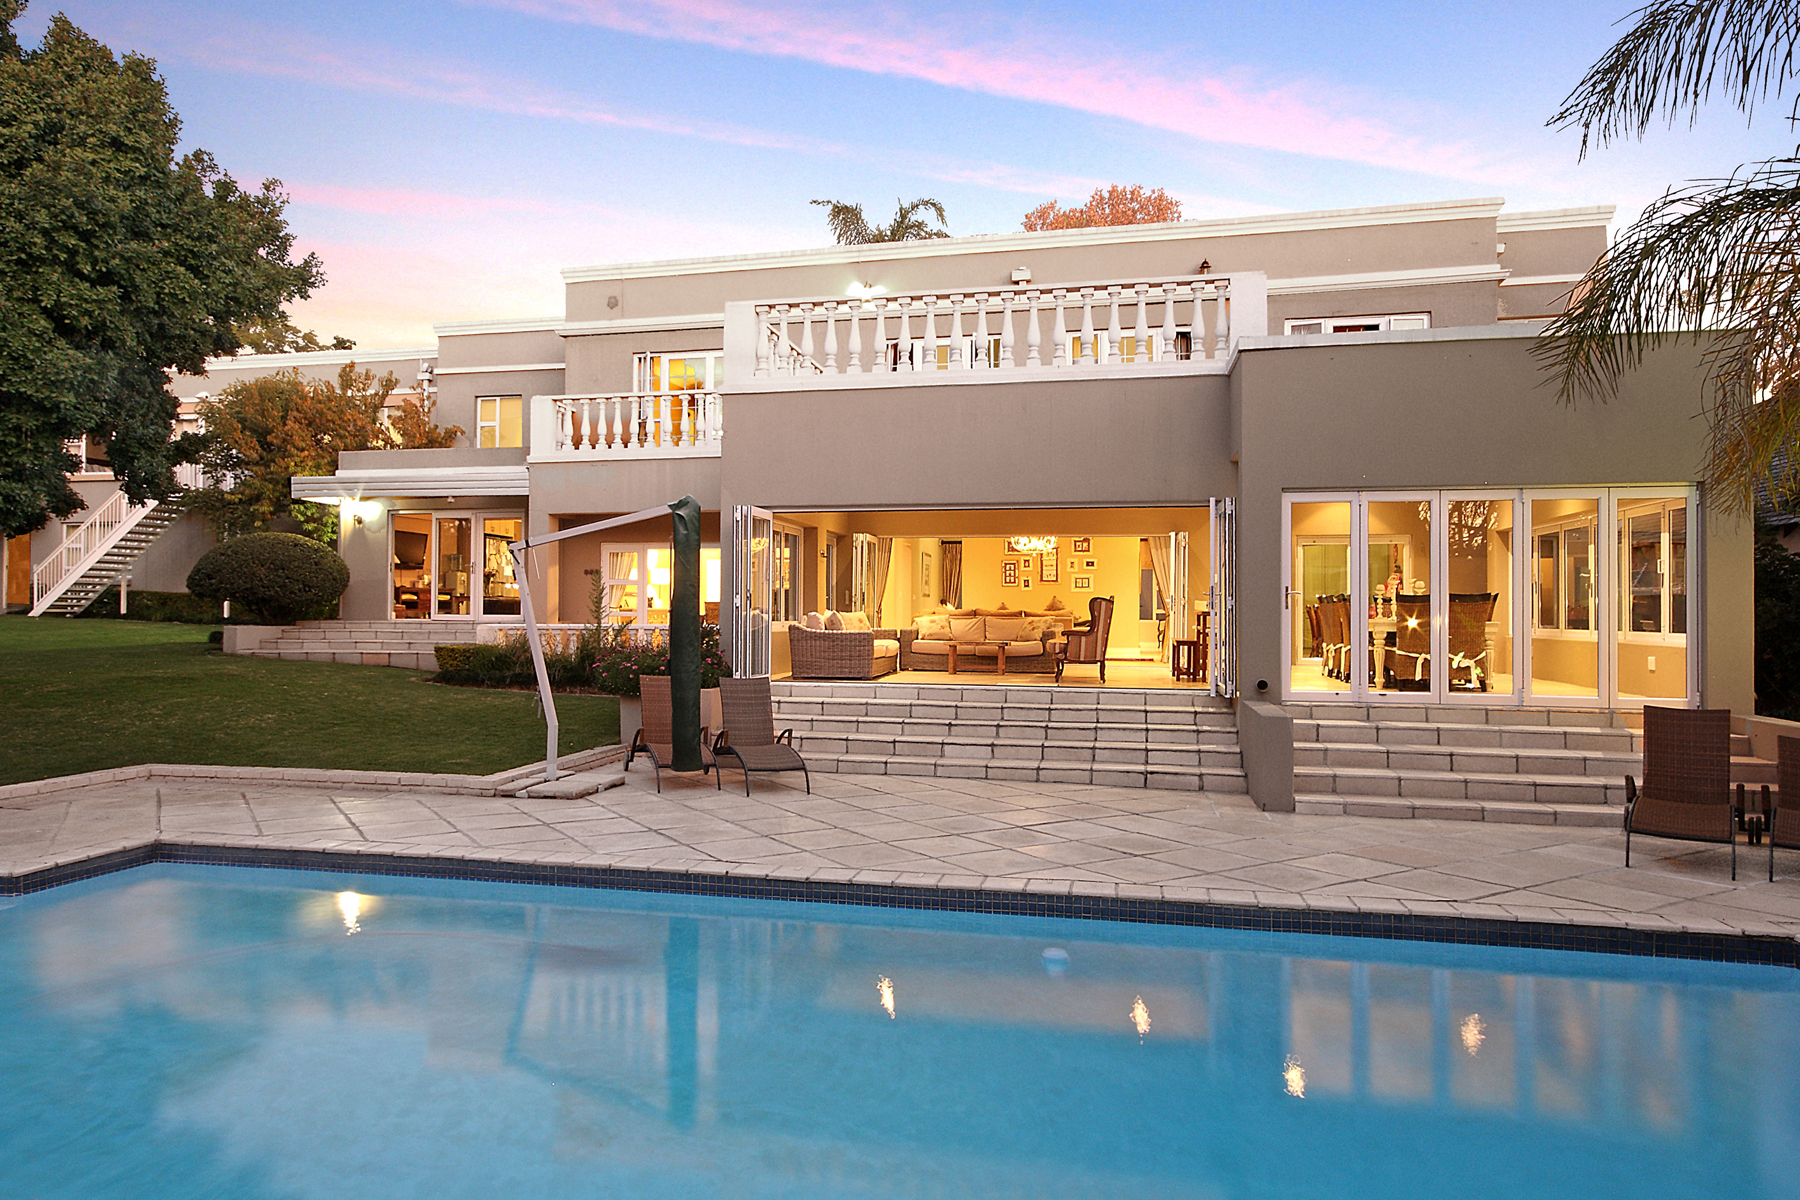 Casa Unifamiliar por un Venta en Morningside Johannesburg, Provincia De Gauteng, 2057 Sudáfrica